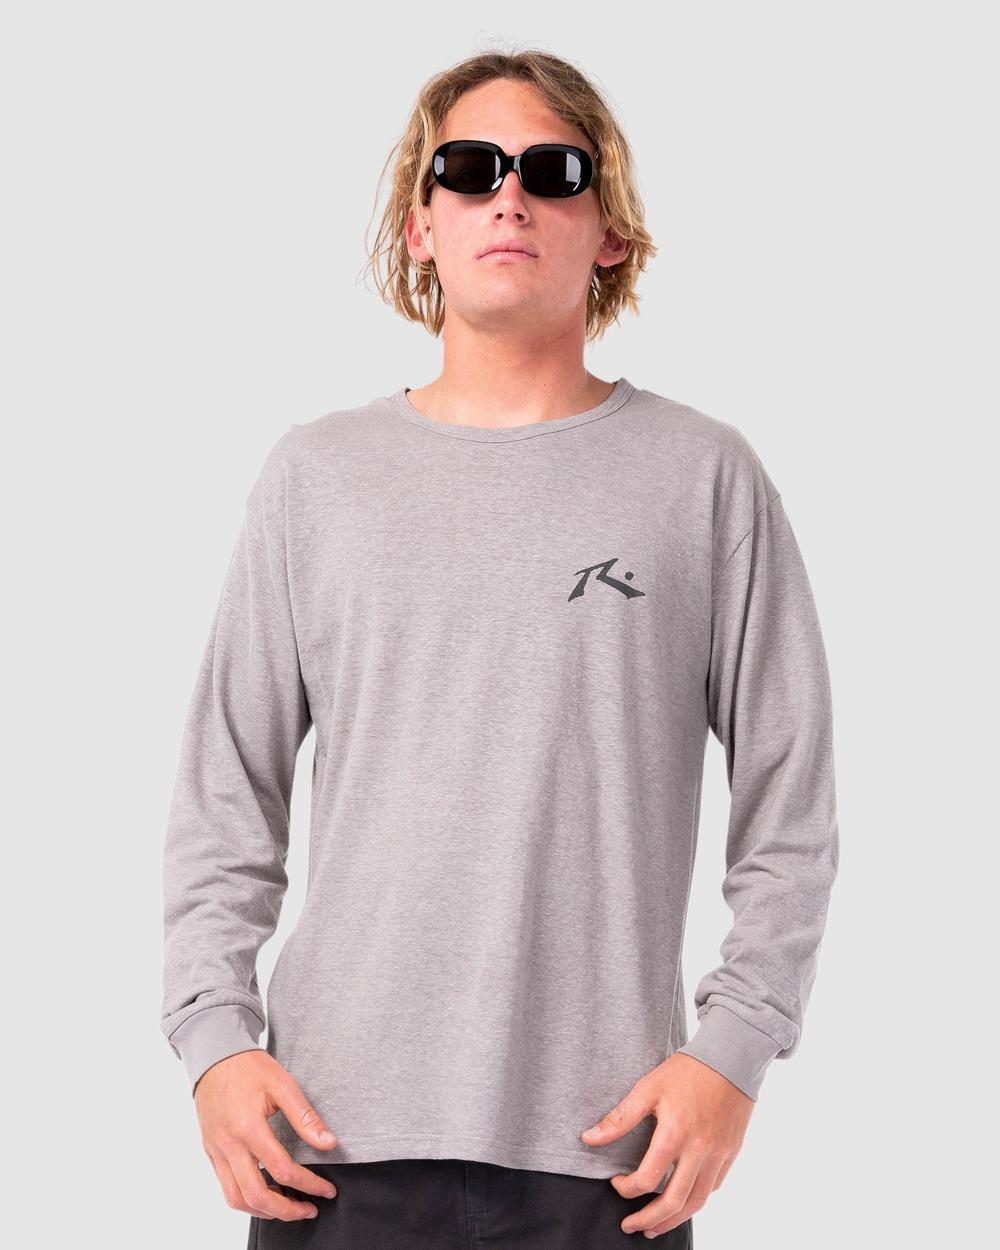 Rusty - One Hit Hemp Long Sleeve Tee - Long Sleeve T-Shirts (FGR) One Hit Hemp Long Sleeve Tee